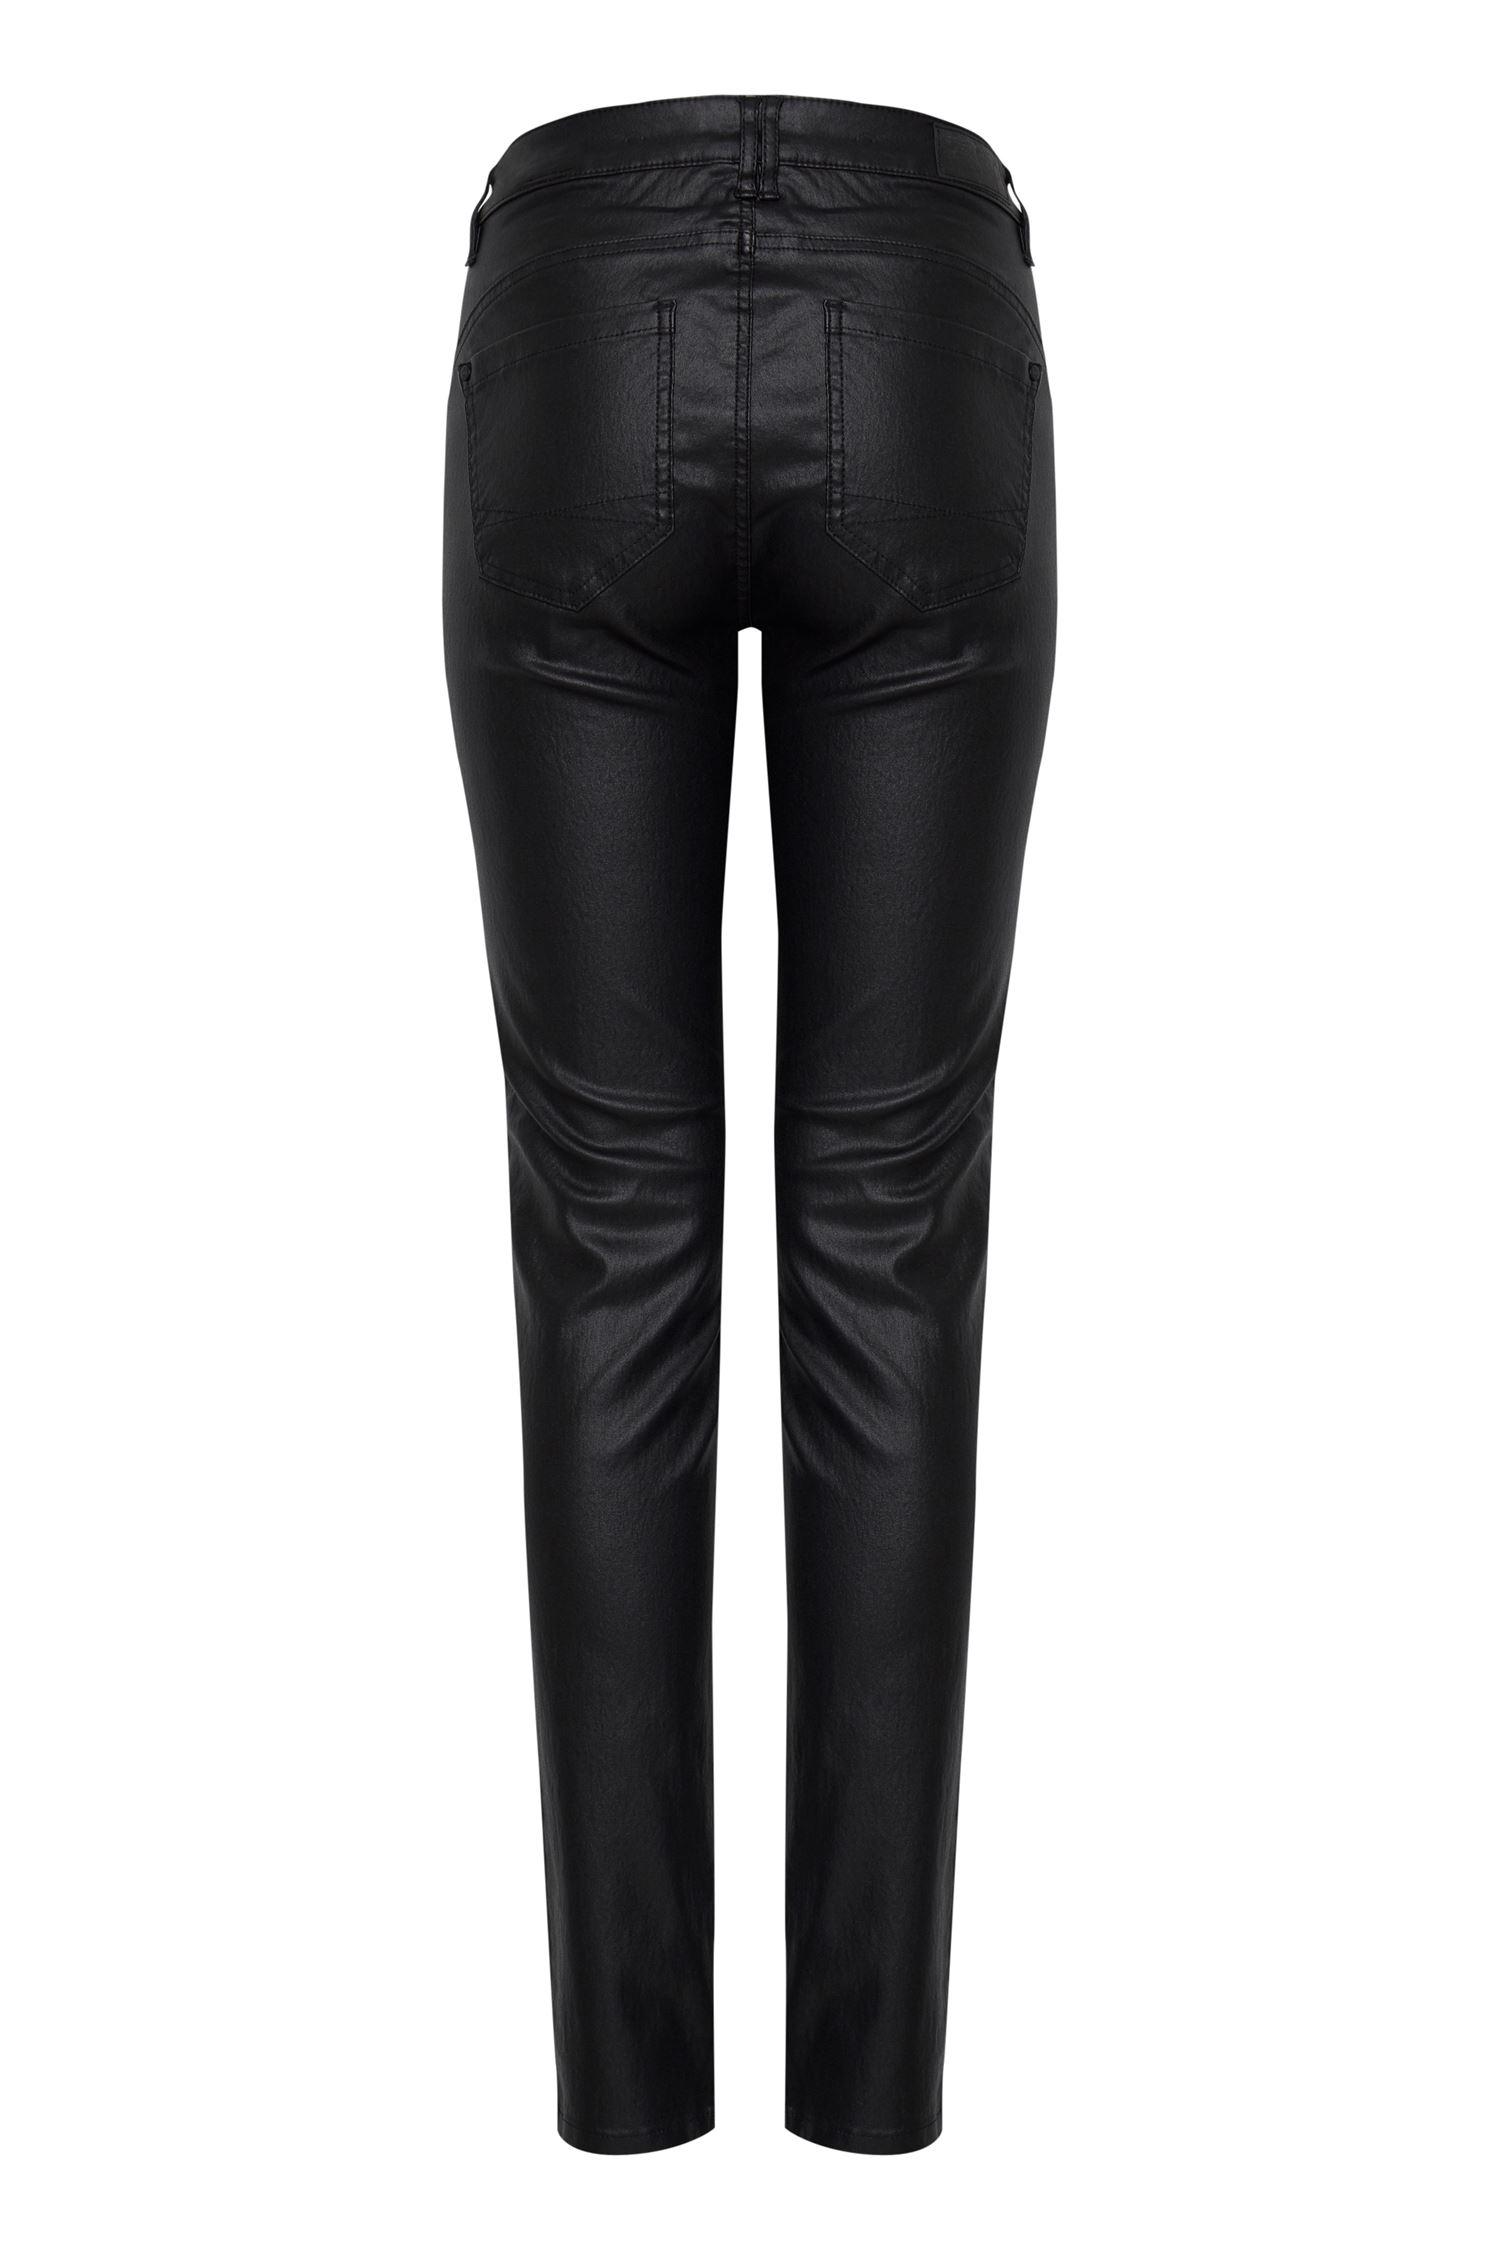 Fransa FRNotalin pants, black, 36